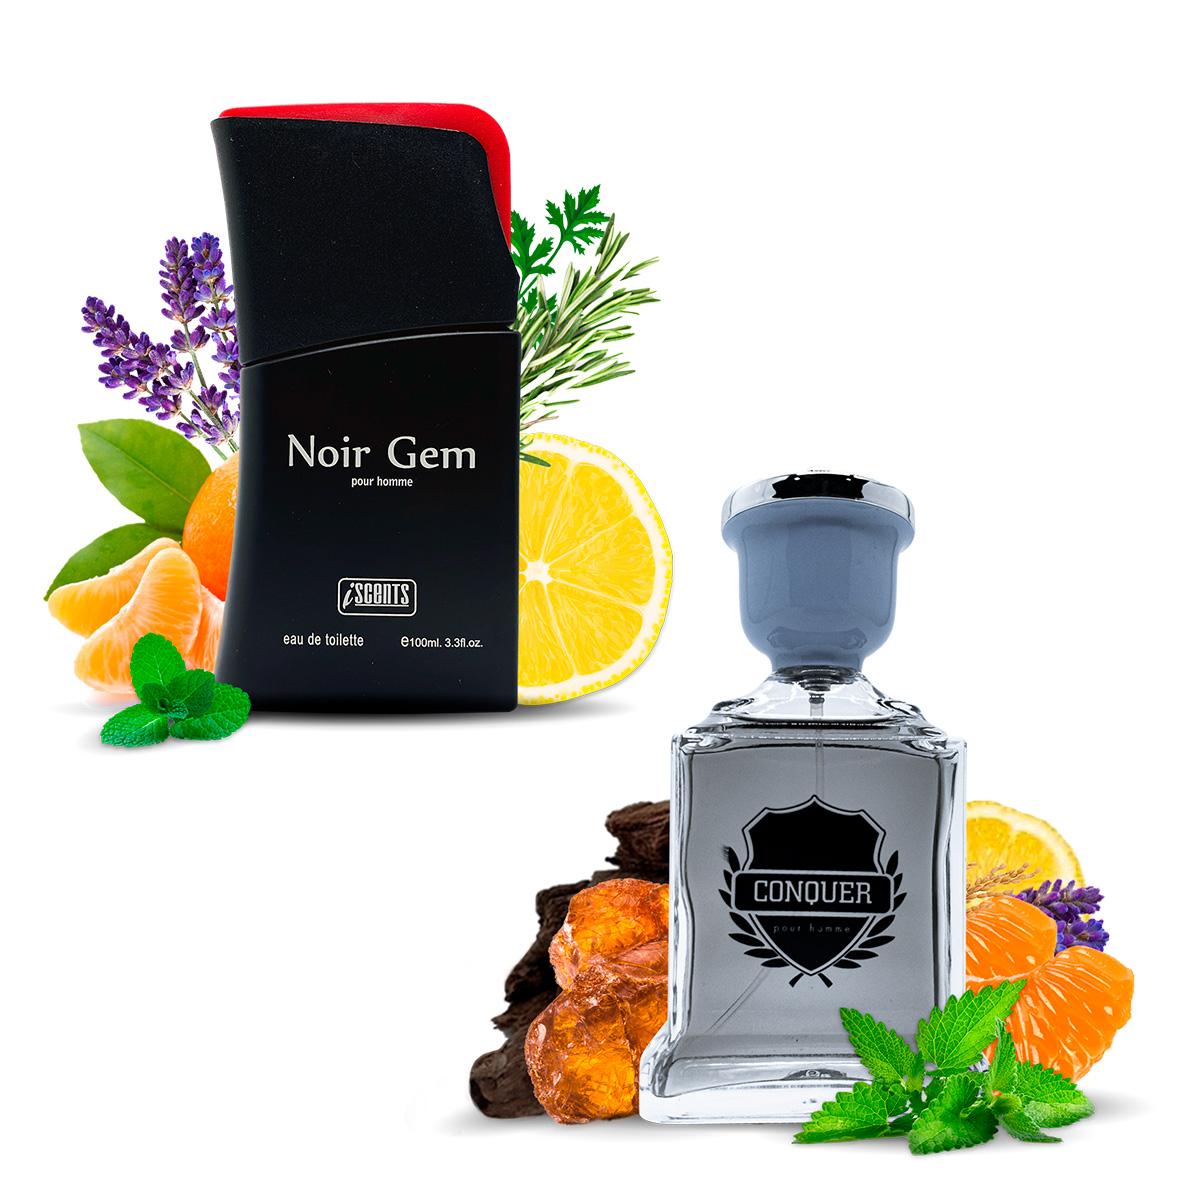 Kit 2 Perfumes Importados Noir Gem e Conquer I Scents